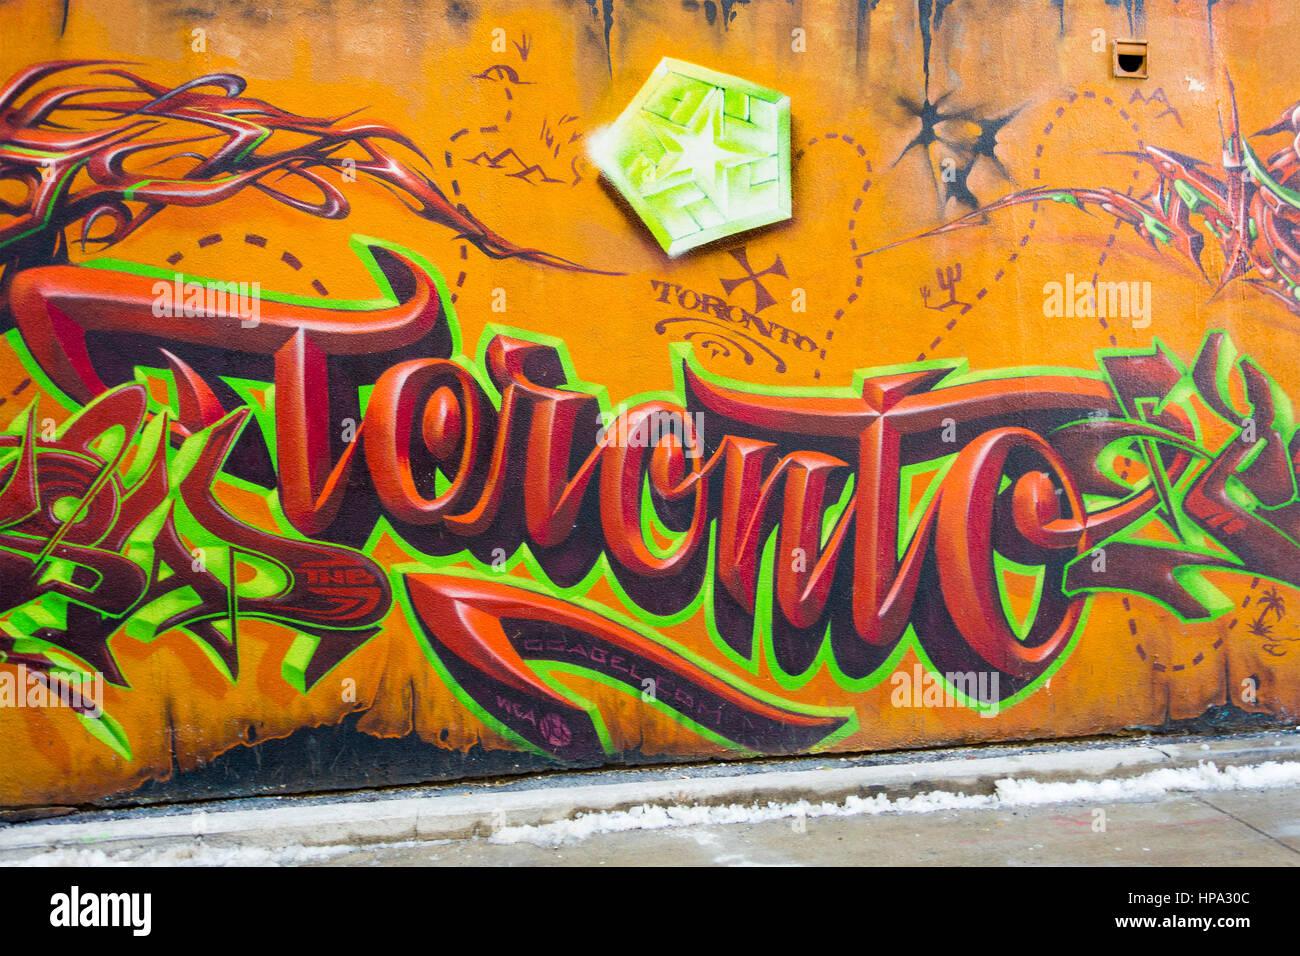 graffit-artwork-in-graffiti-alley-just-s